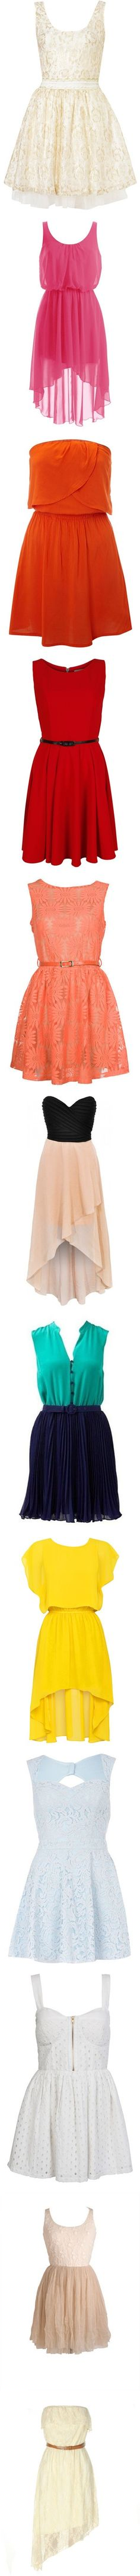 gorgeous dress options.